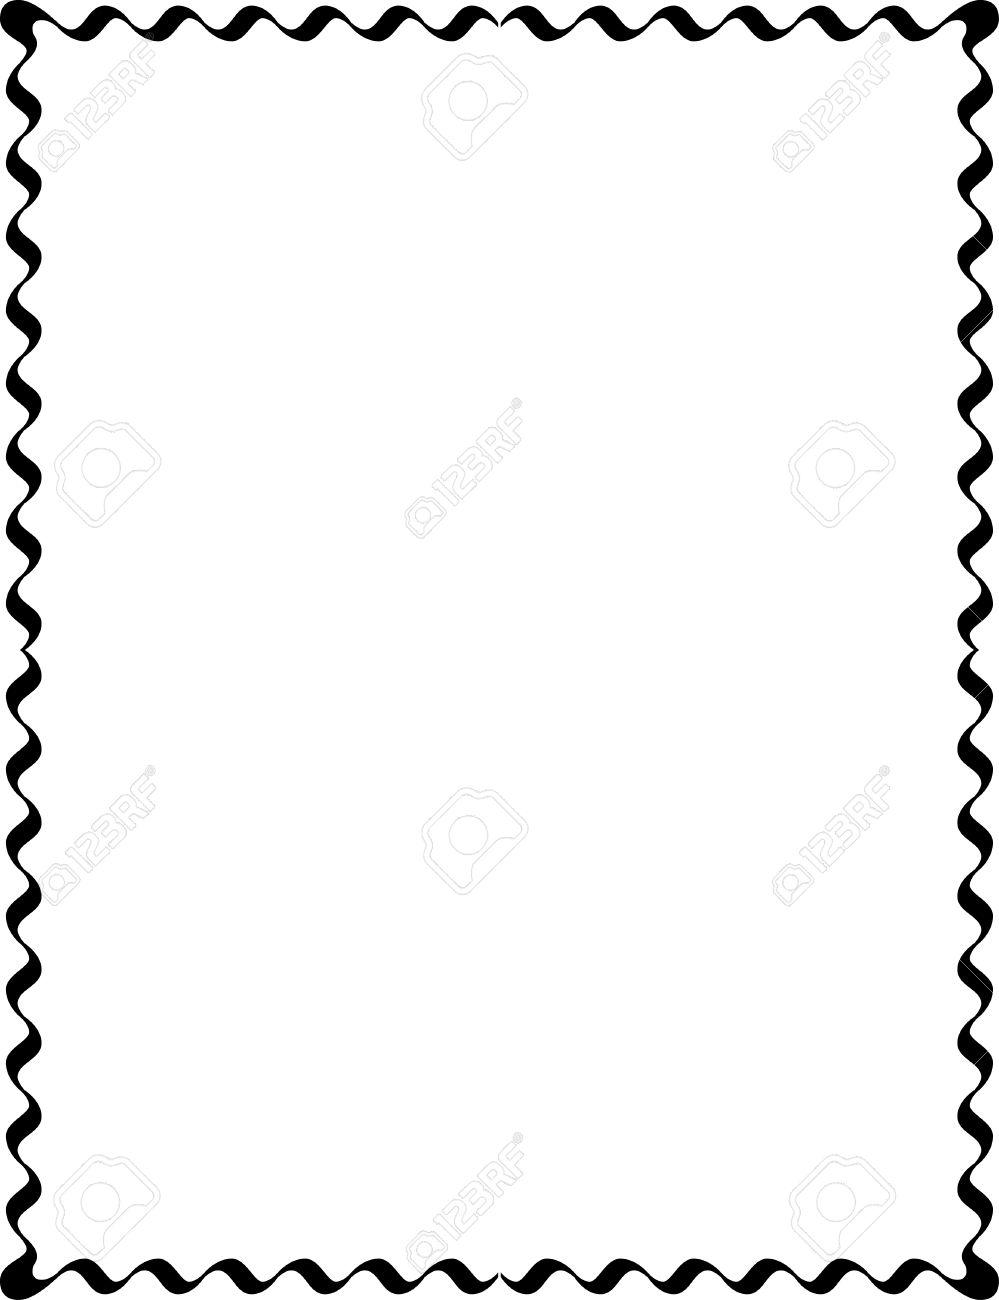 simple lines border frame vector design monochrome royalty free rh 123rf com border vectors png border vectors pinterest